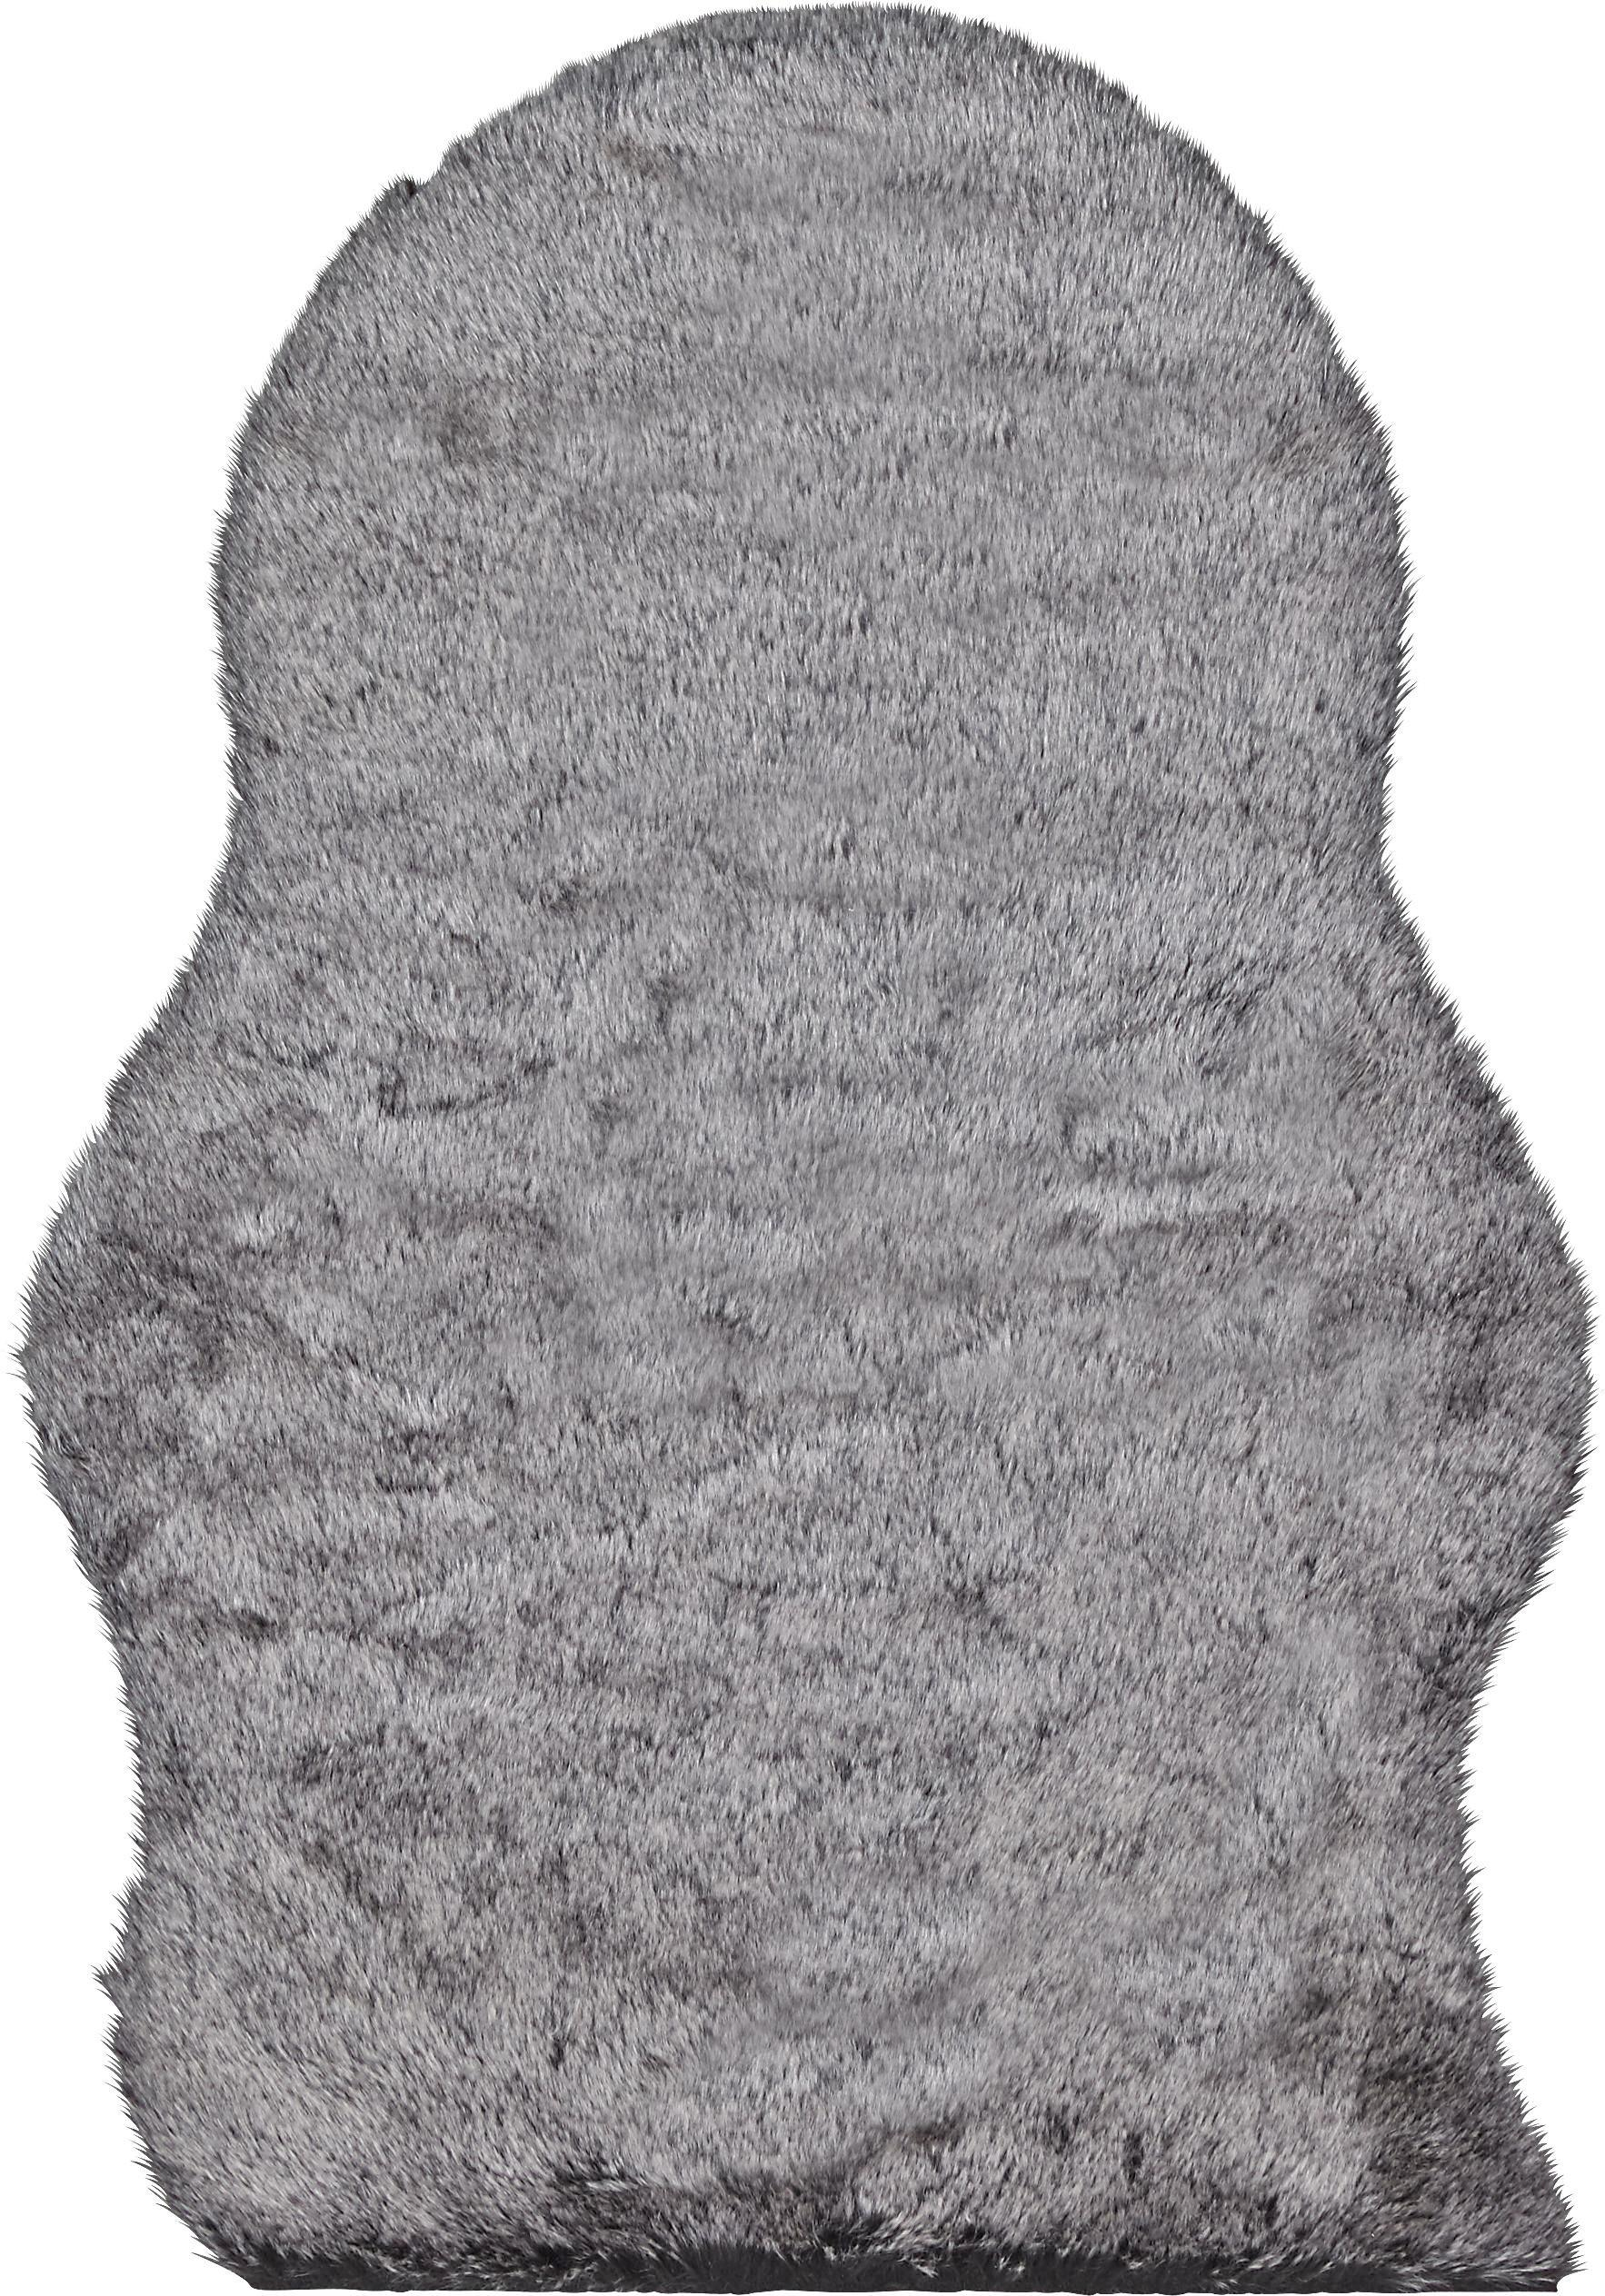 Kunstfell Annalena in Grau, ca. 60x90cm - Grau, ROMANTIK / LANDHAUS, Textil (60/90cm) - MÖMAX modern living